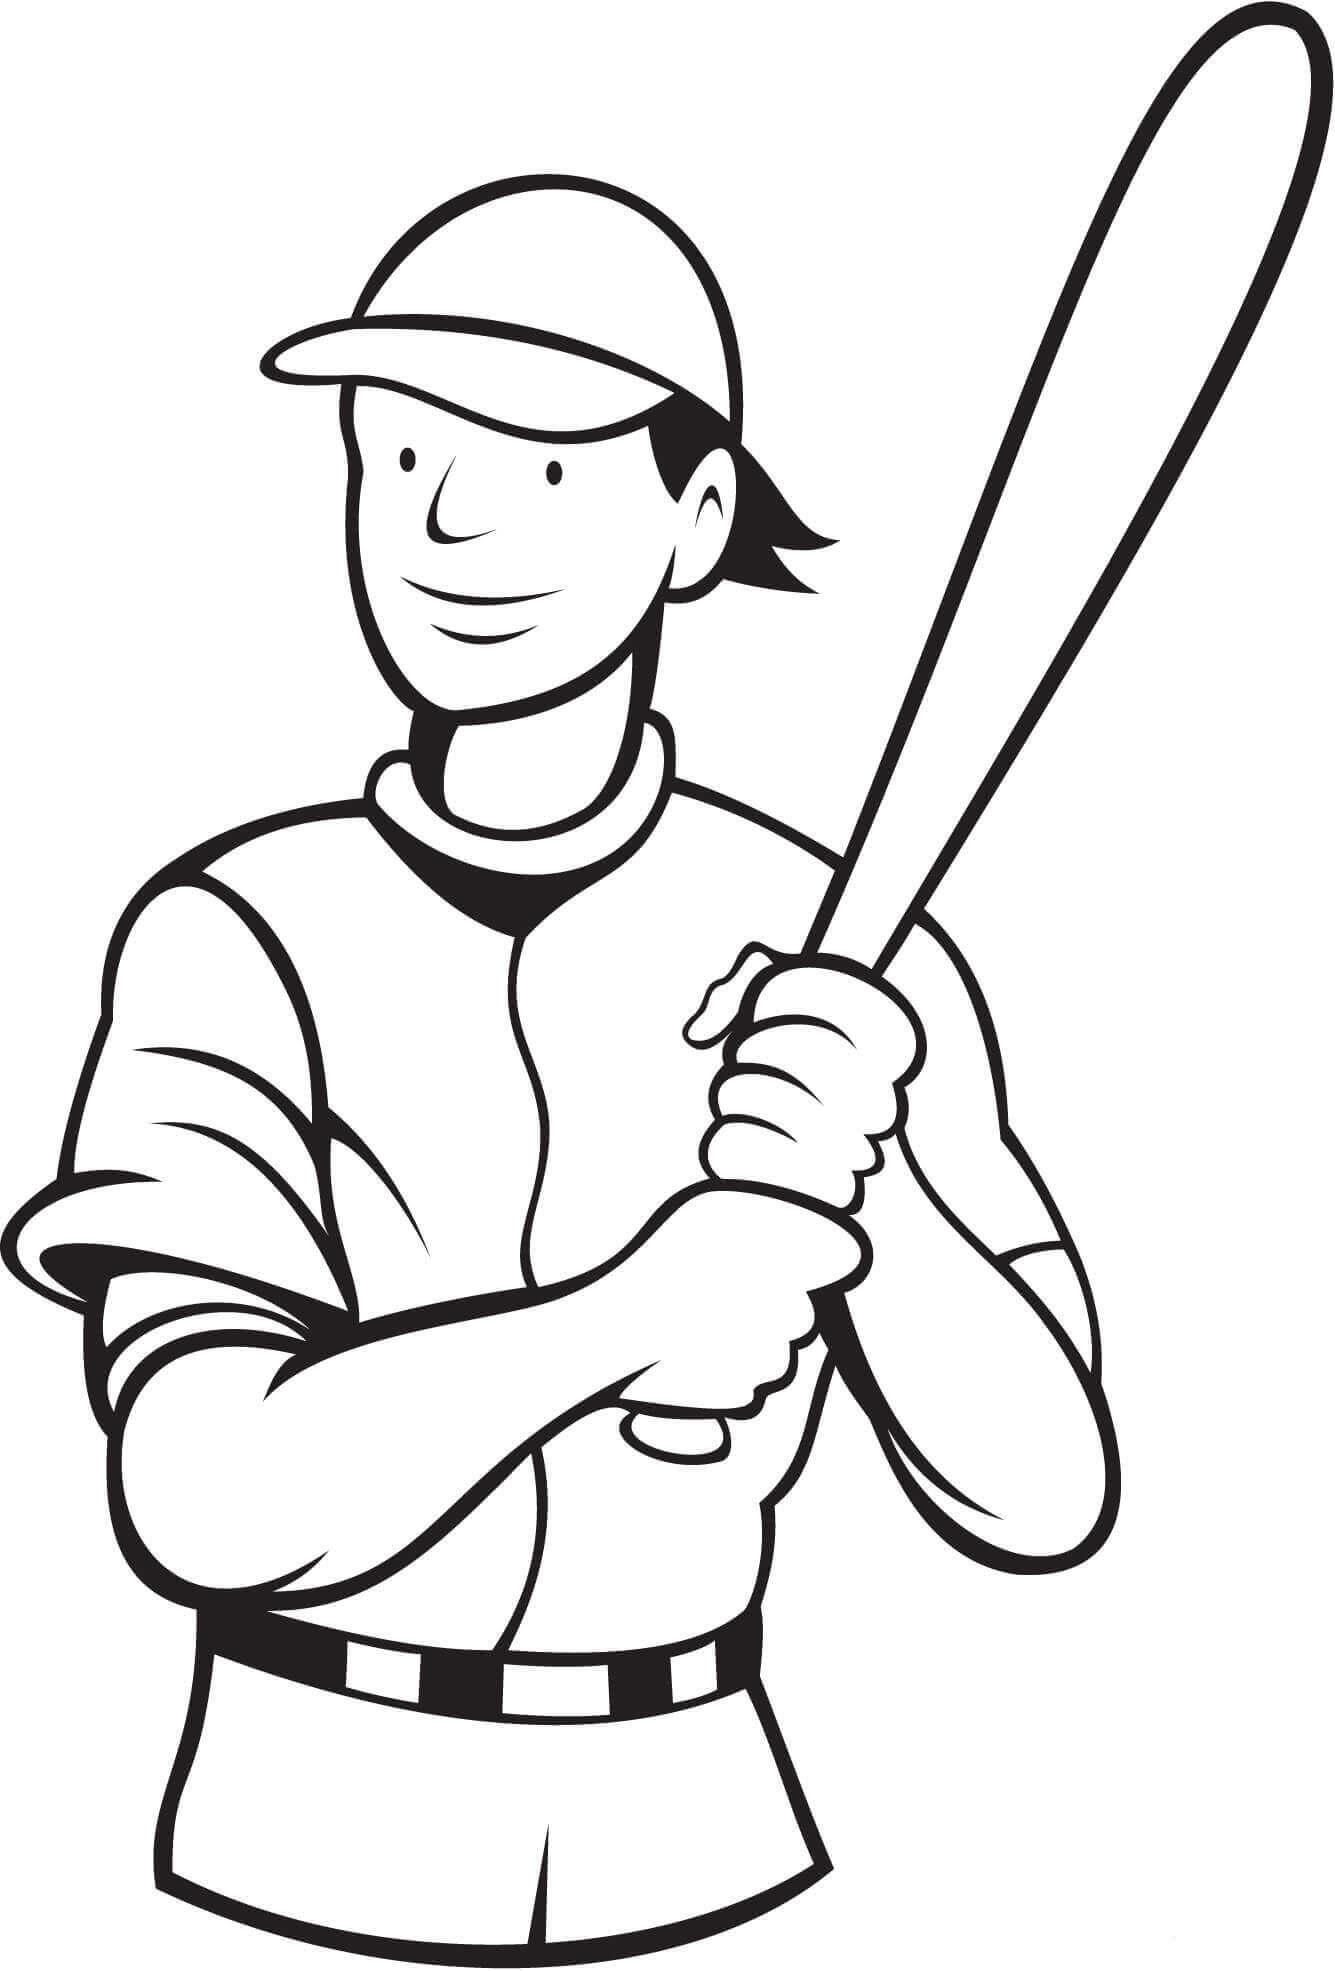 30 Free Printable Baseball Coloring Pages